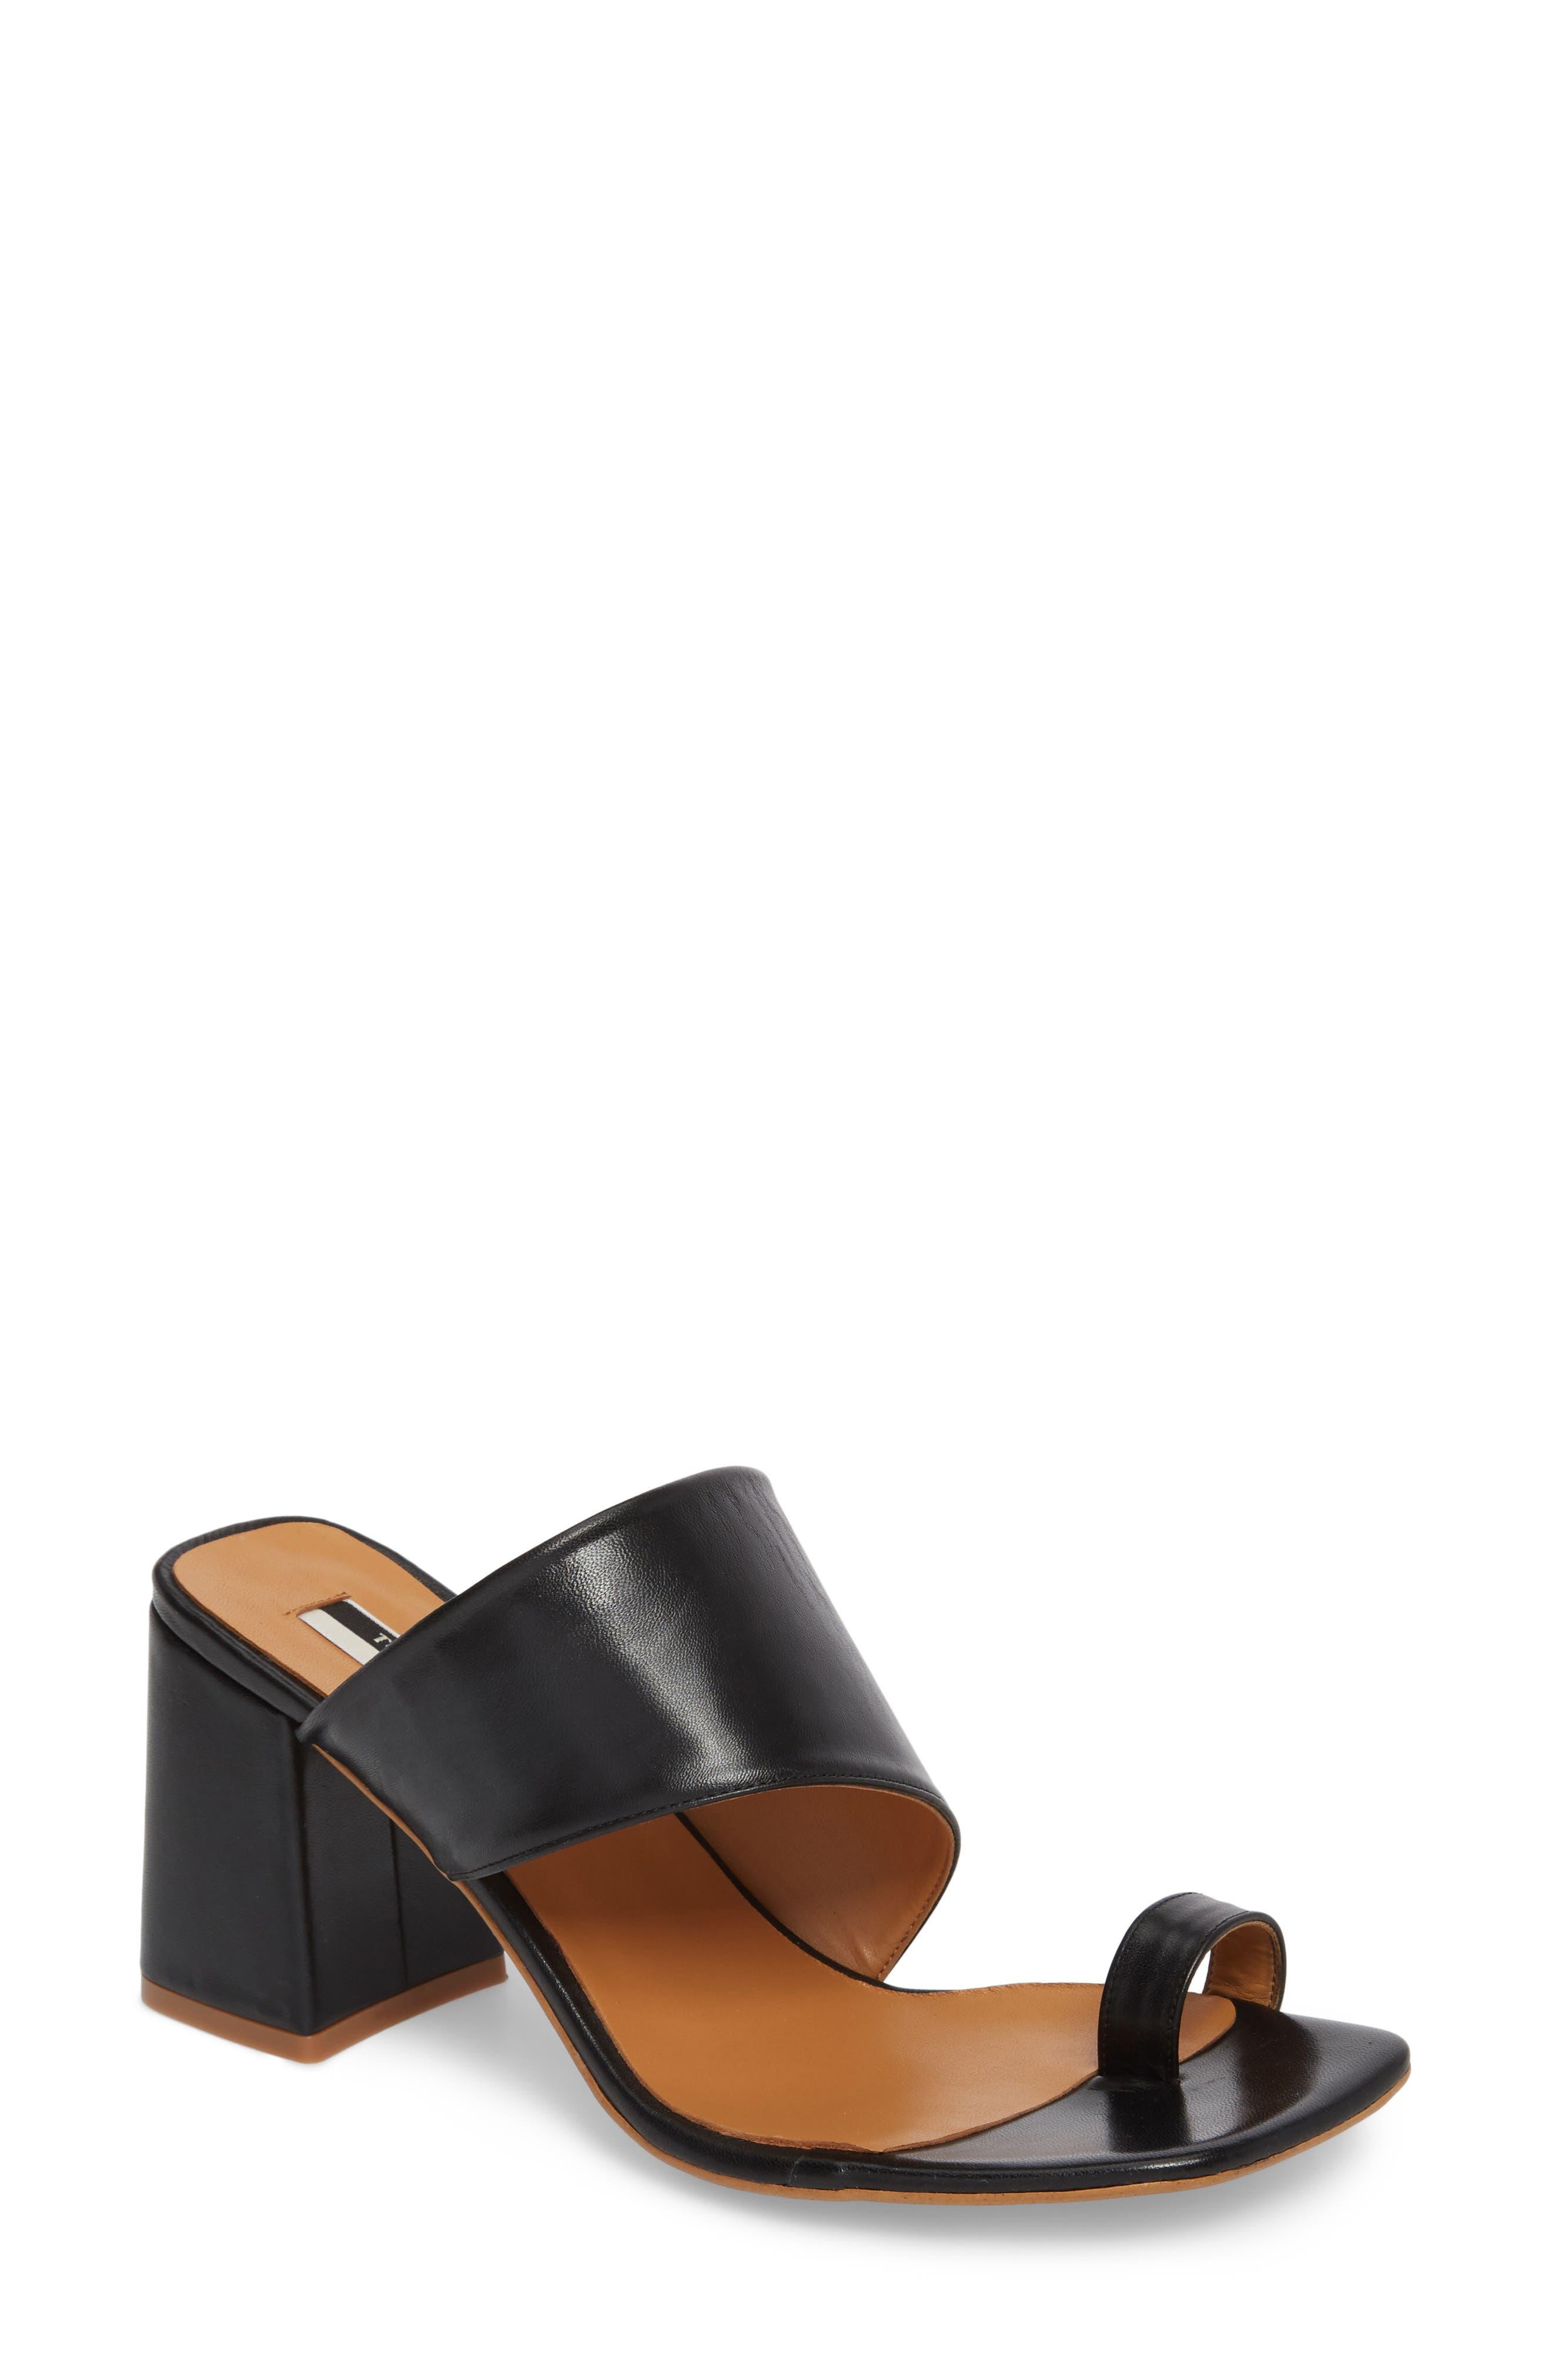 Nimble Toe Loop Slide Sandal,                         Main,                         color, Black